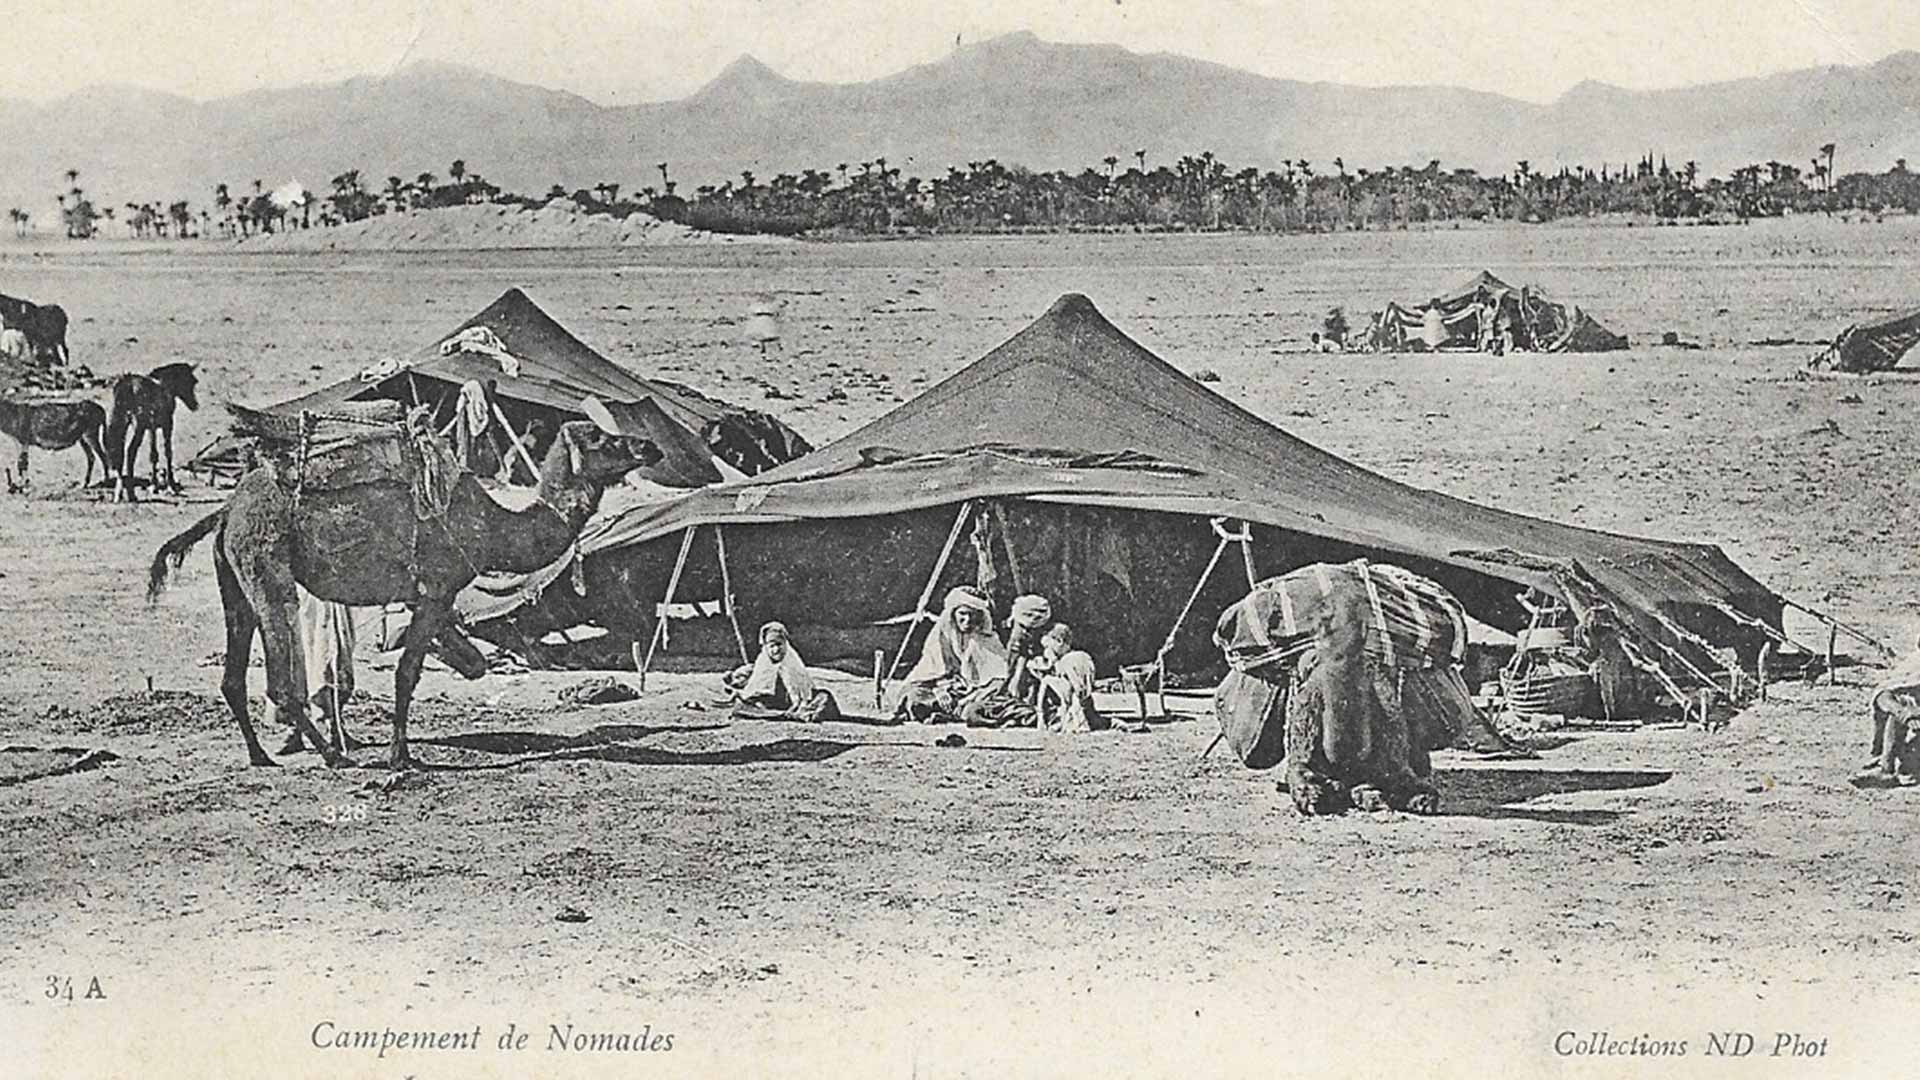 Campements-de-nomades